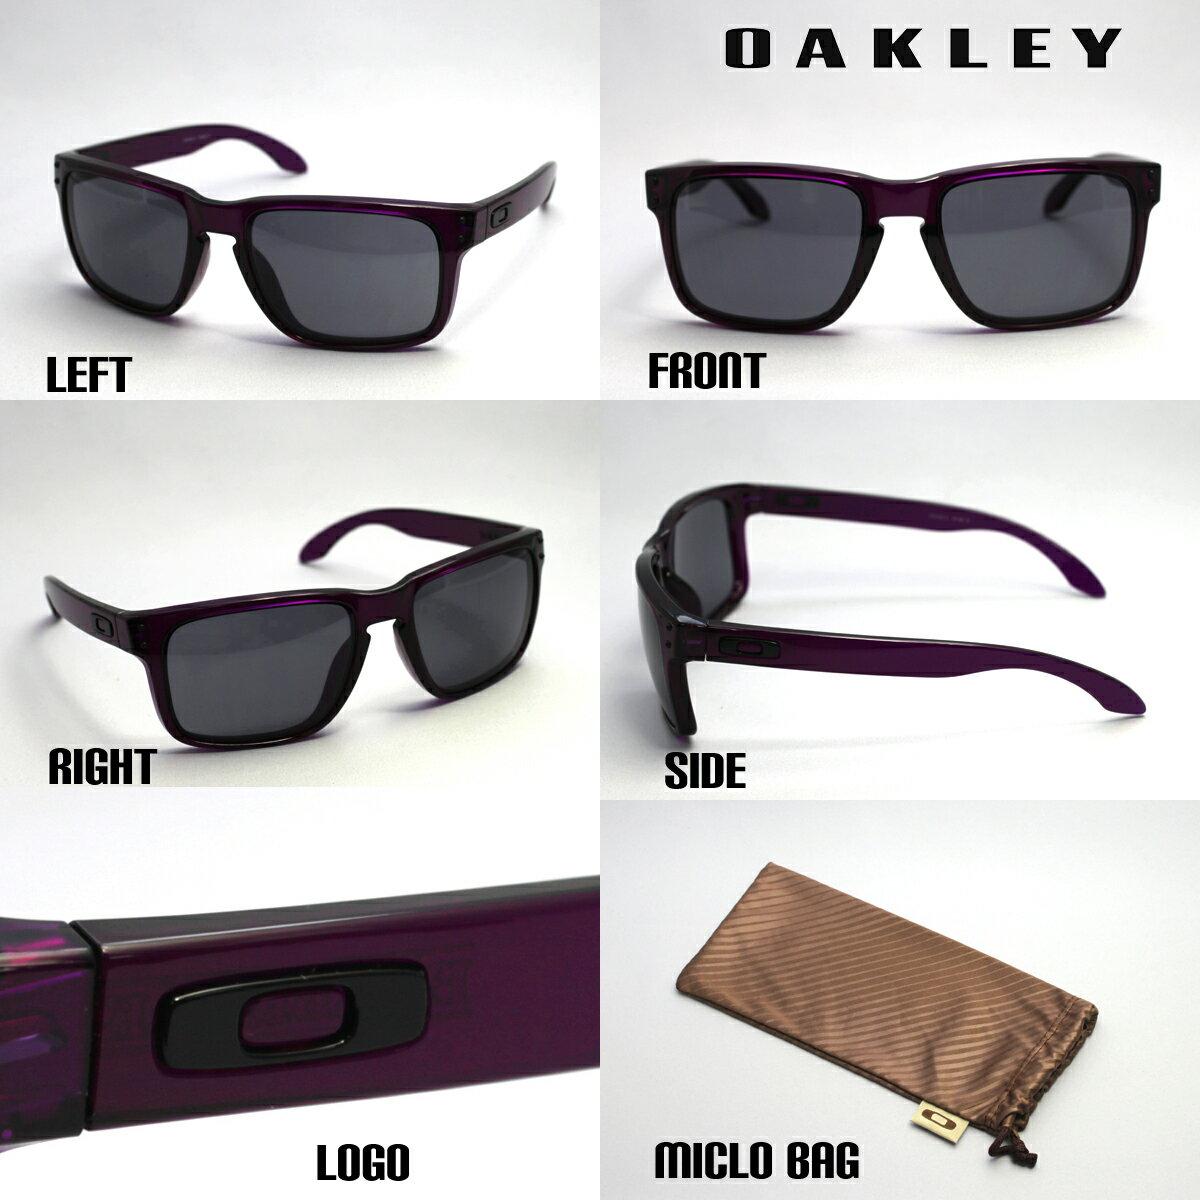 5aae82481747 Oakley Sunglasses Buy Online Nz « Heritage Malta